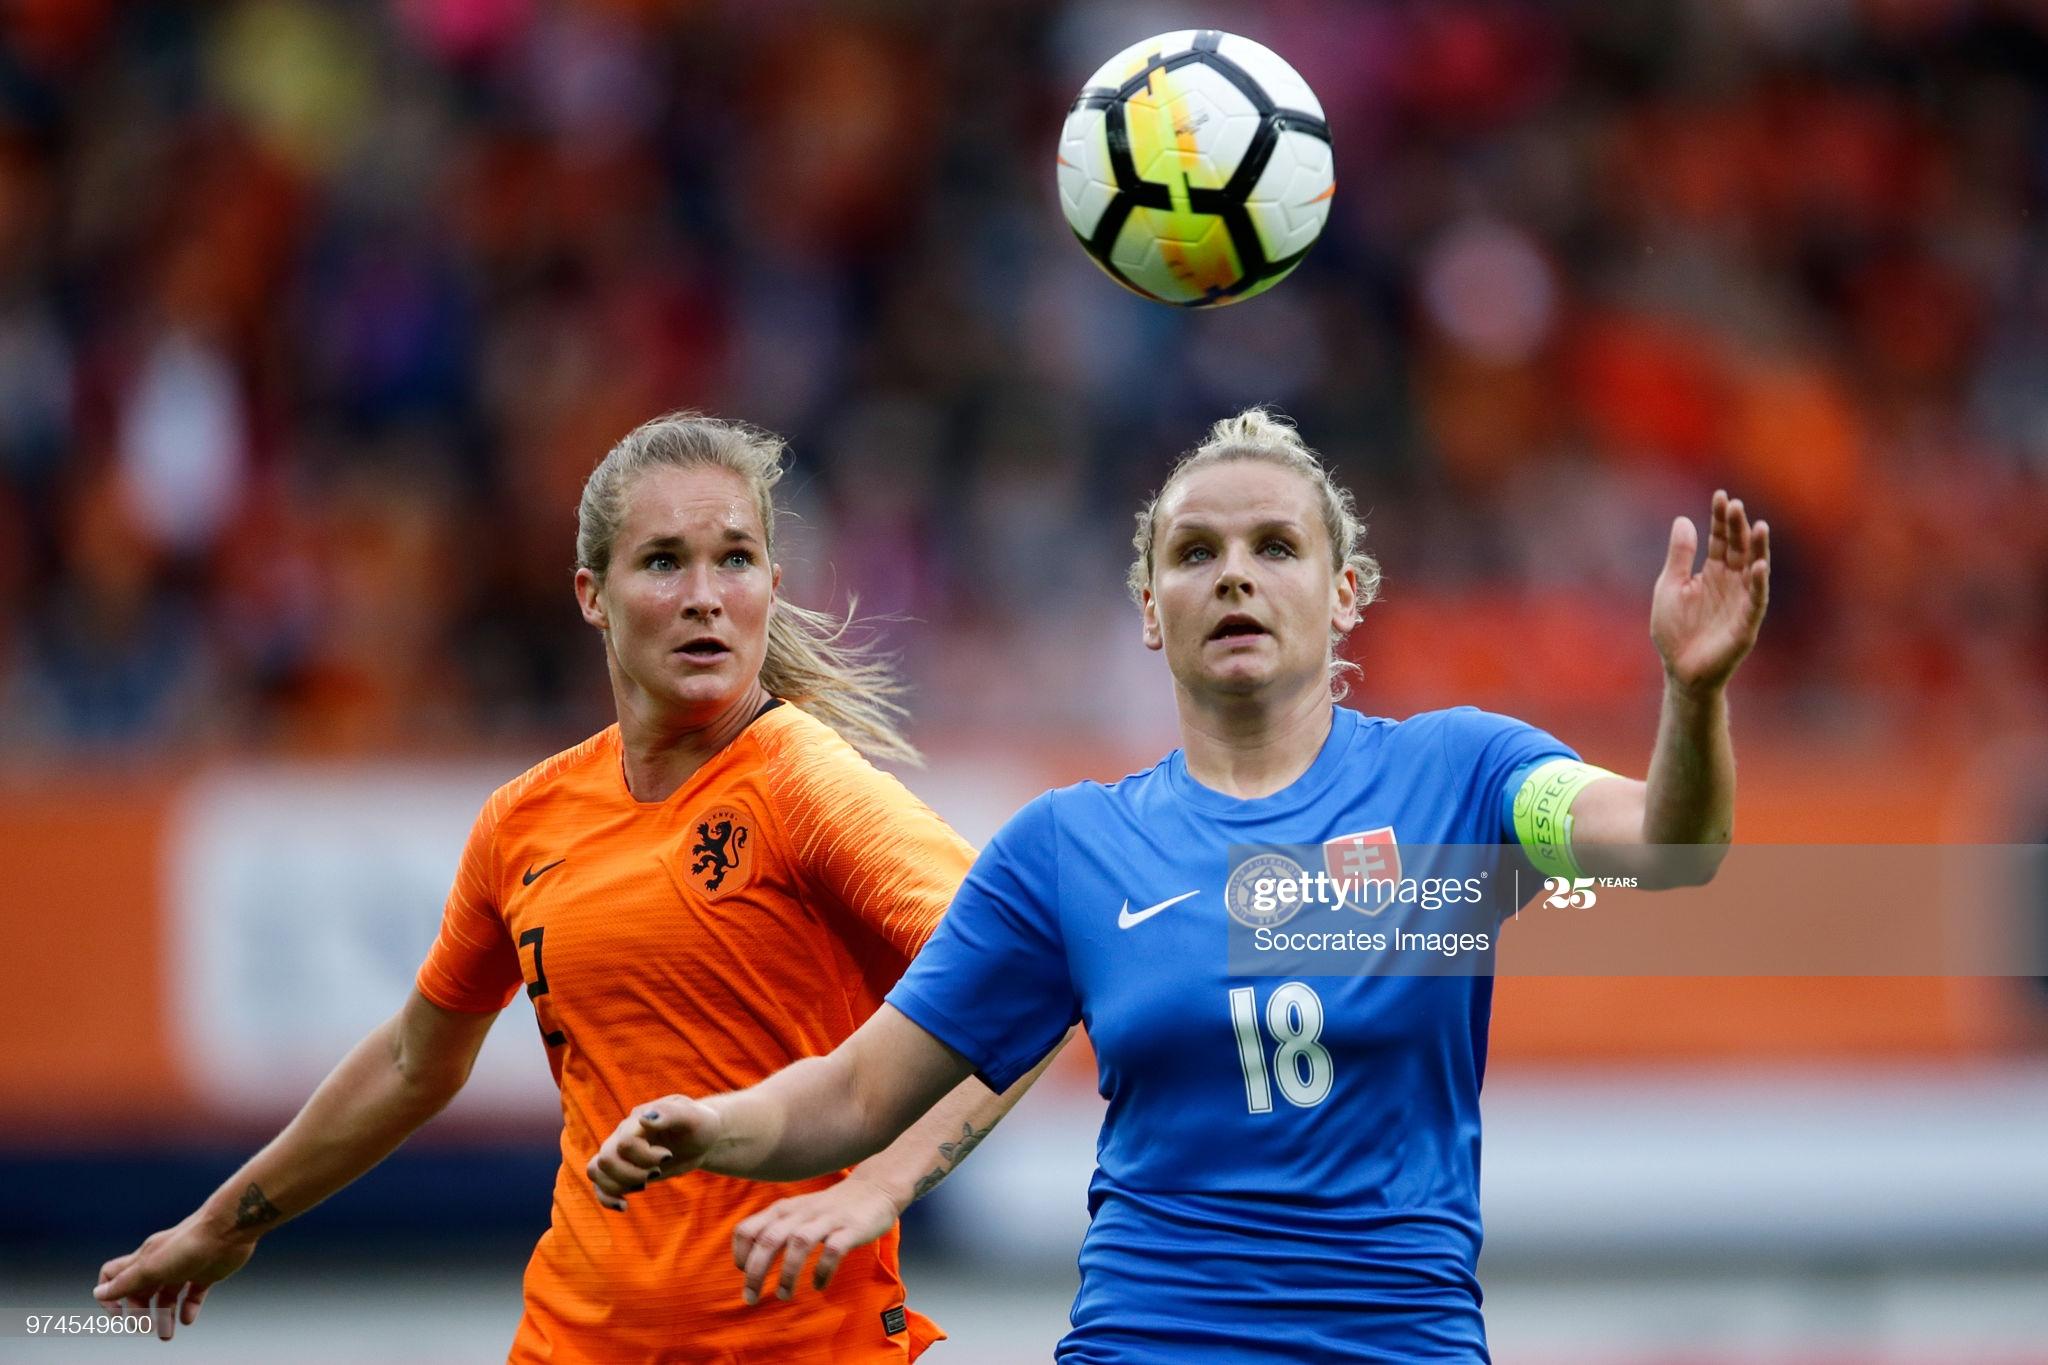 La Slovaquie de Dominika Škorvánková s'incline face à l'Islande